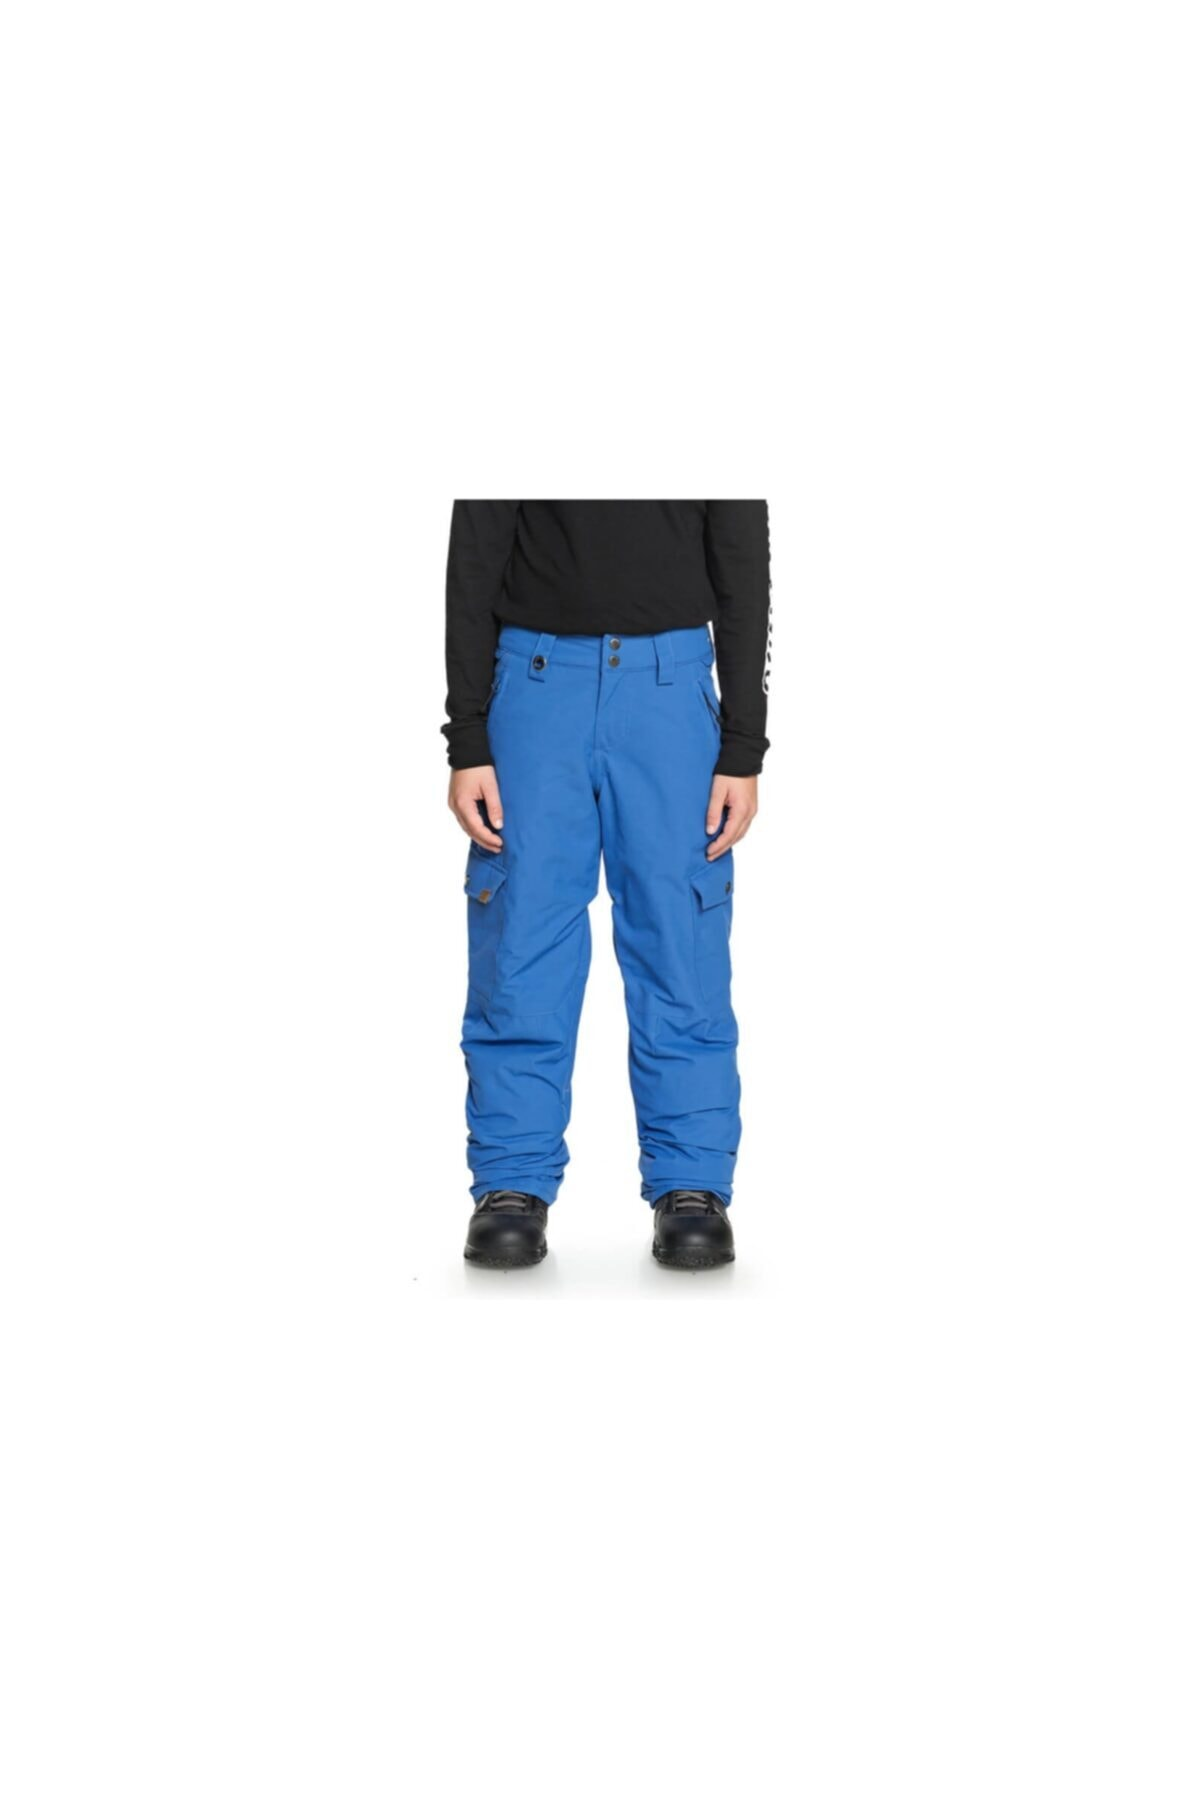 Quiksilver Çocuk  Mavi Porter Youth Kayak/snowboard Pantolonu 1